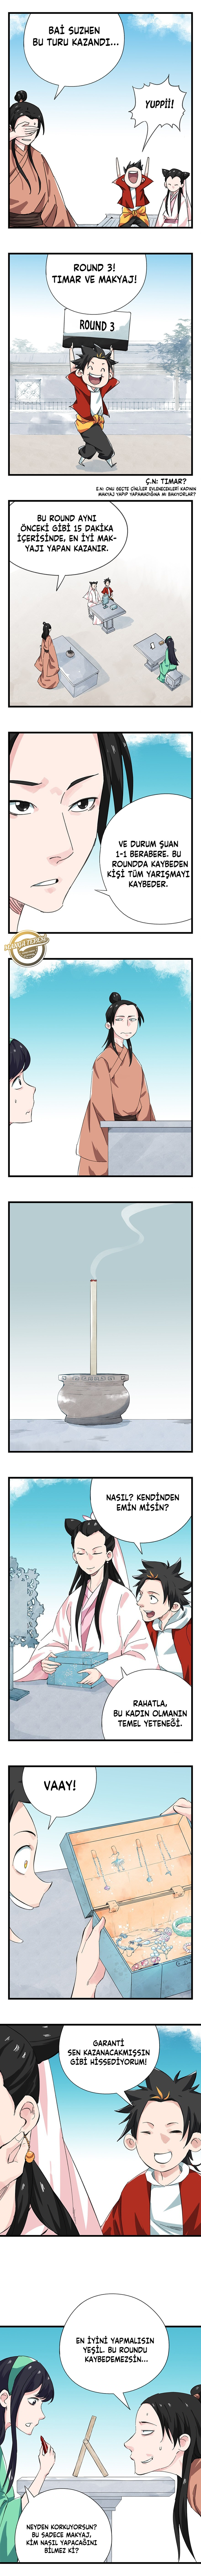 tower-into-the-cloudsbolum-32